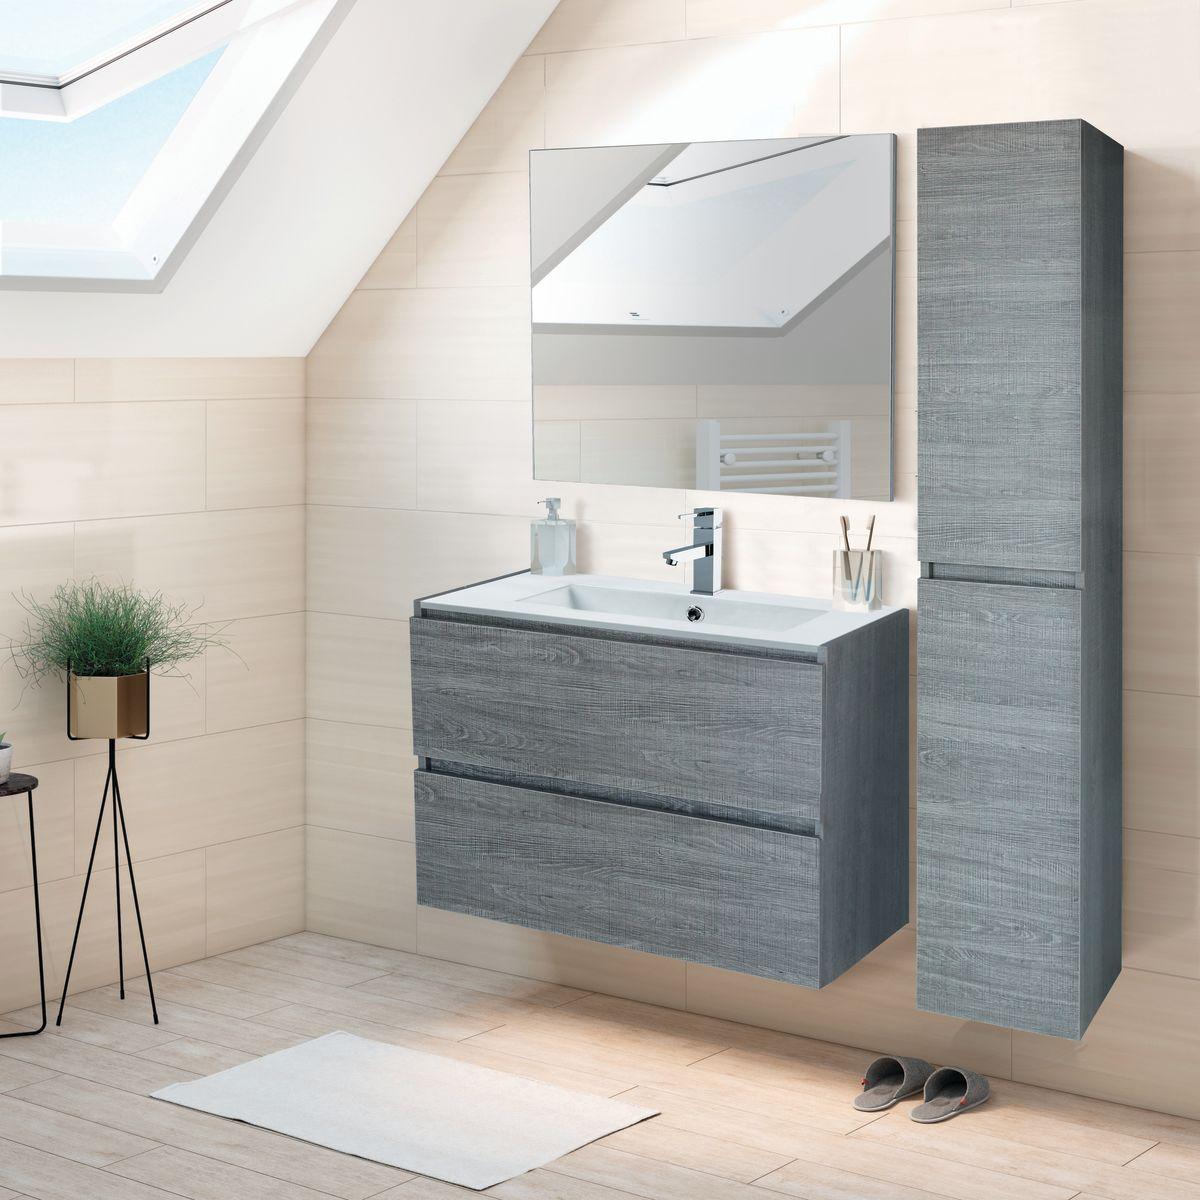 Best mobili bagno moderni sospesi prezzi photos for Offerte mobili bagno moderni